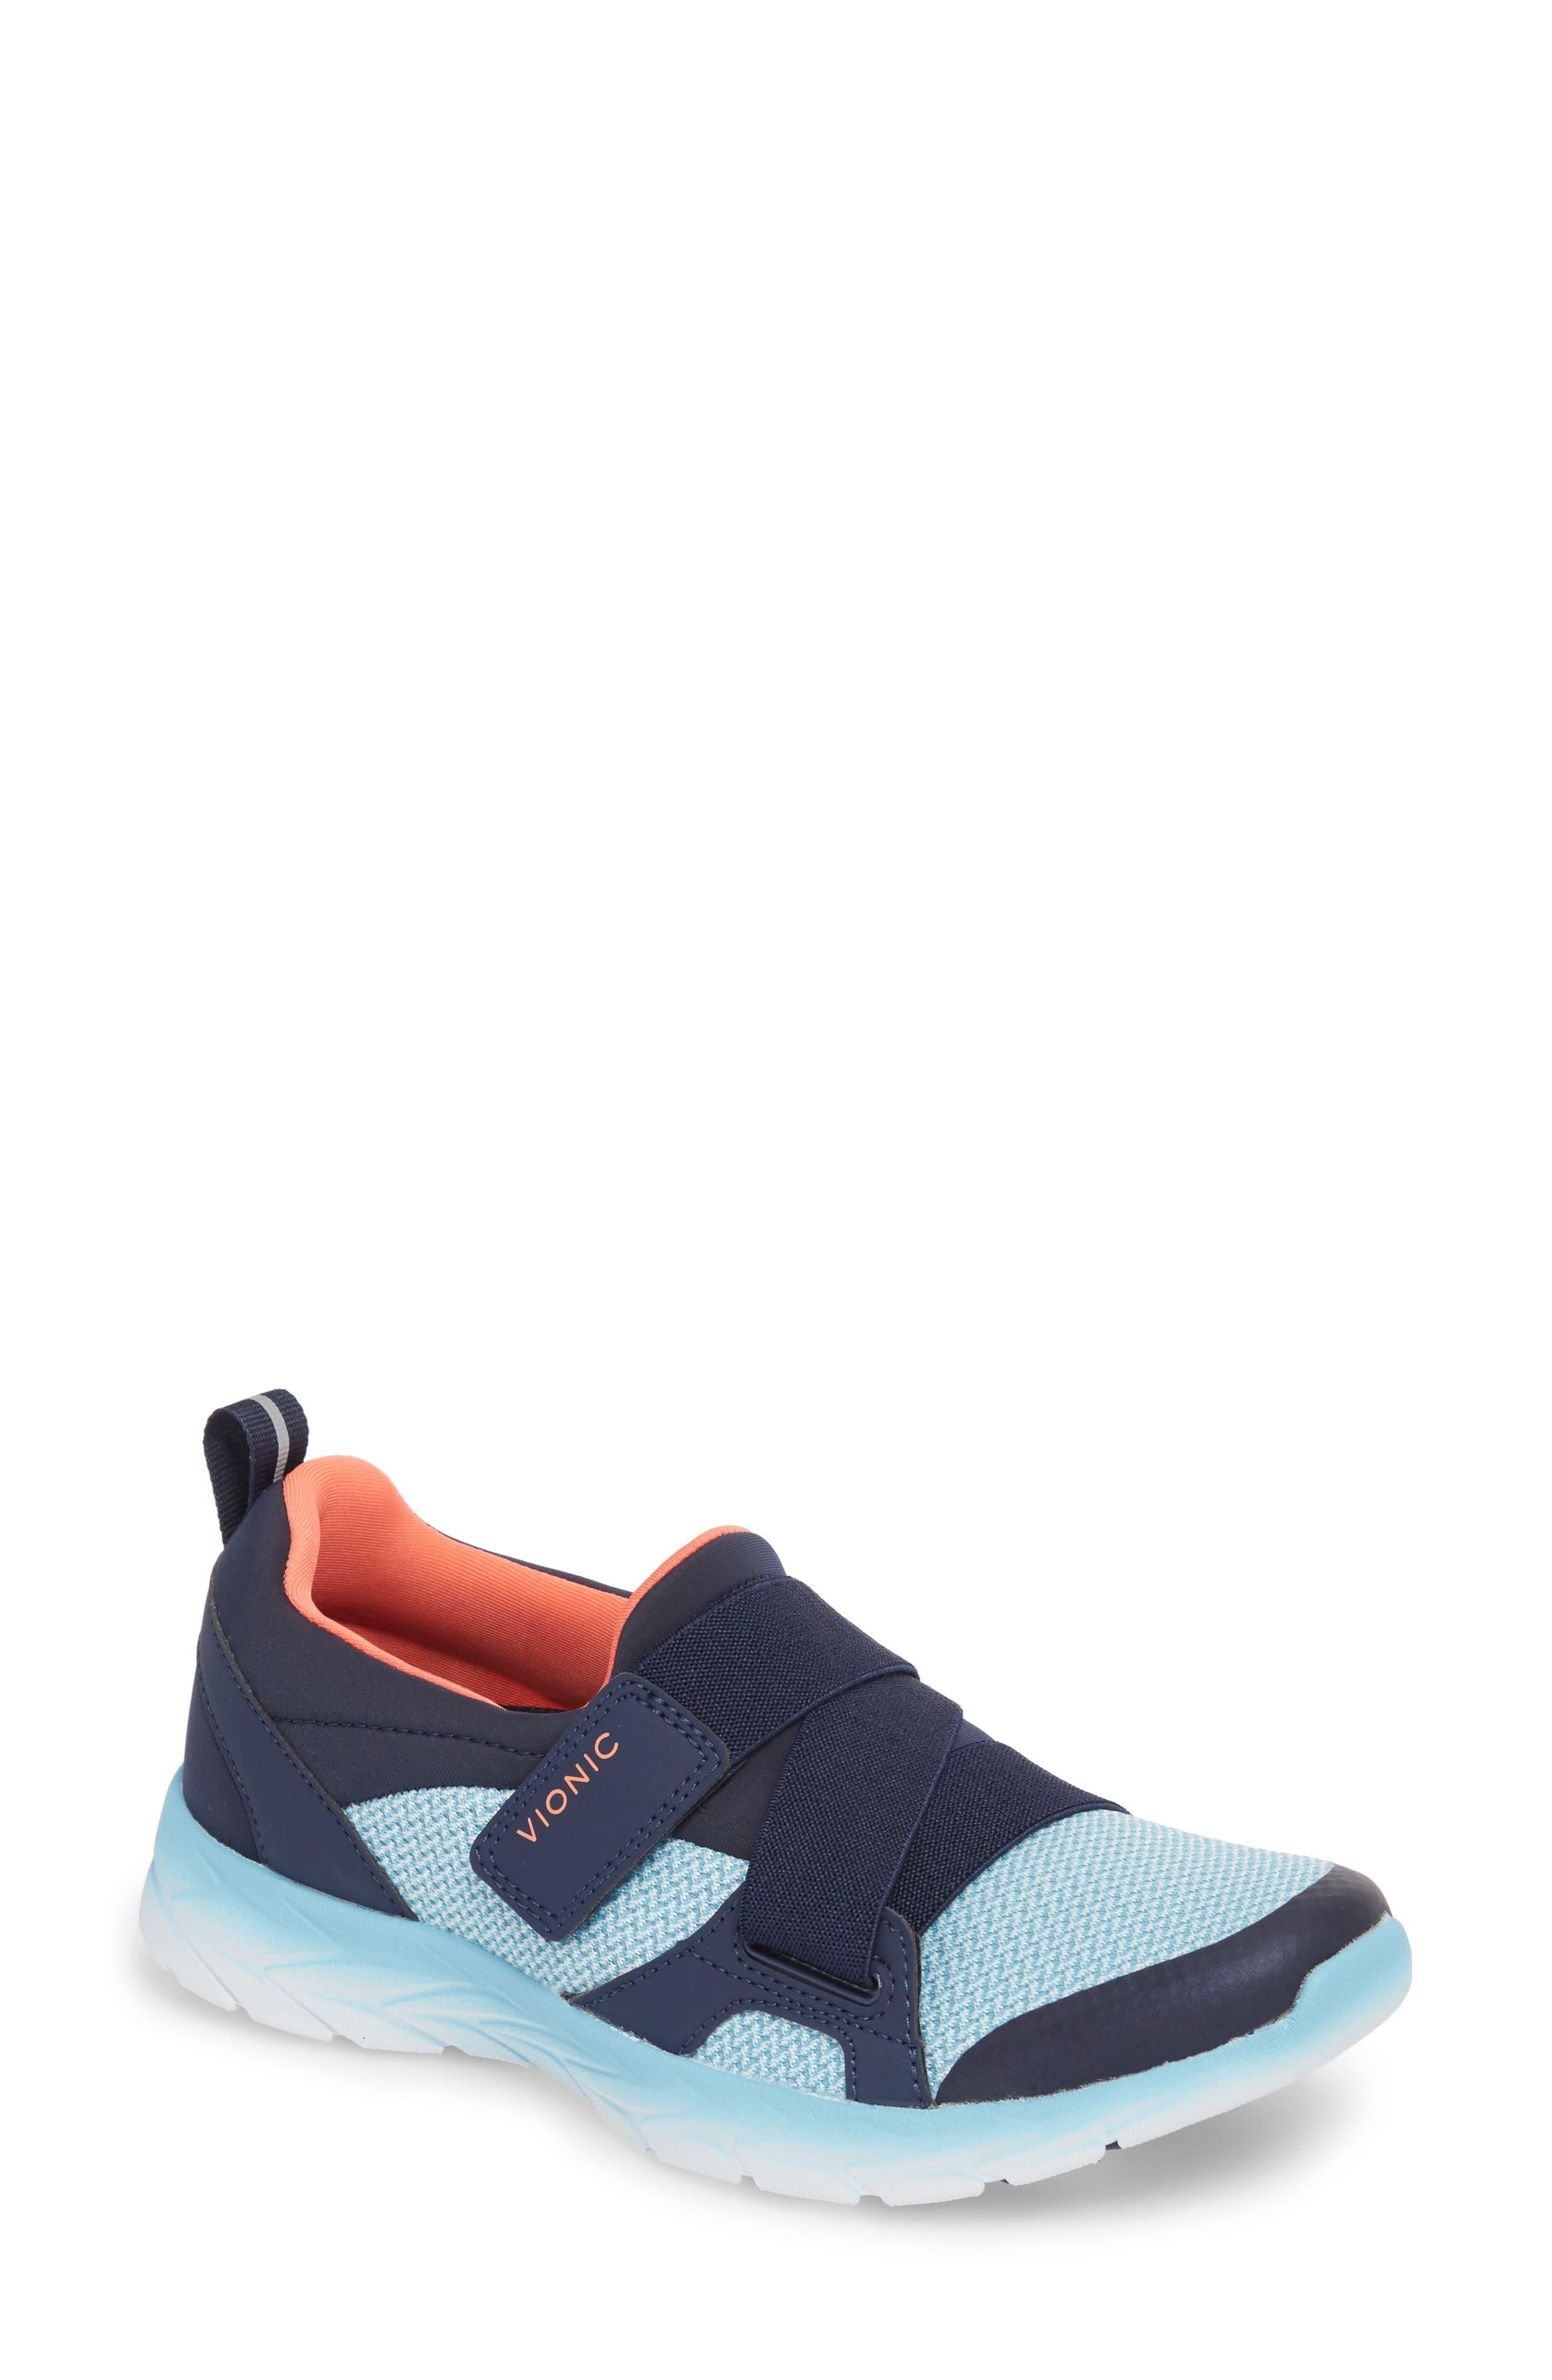 Dash Sneaker,                         Main,                         color, Navy/ Light Blue Fabric